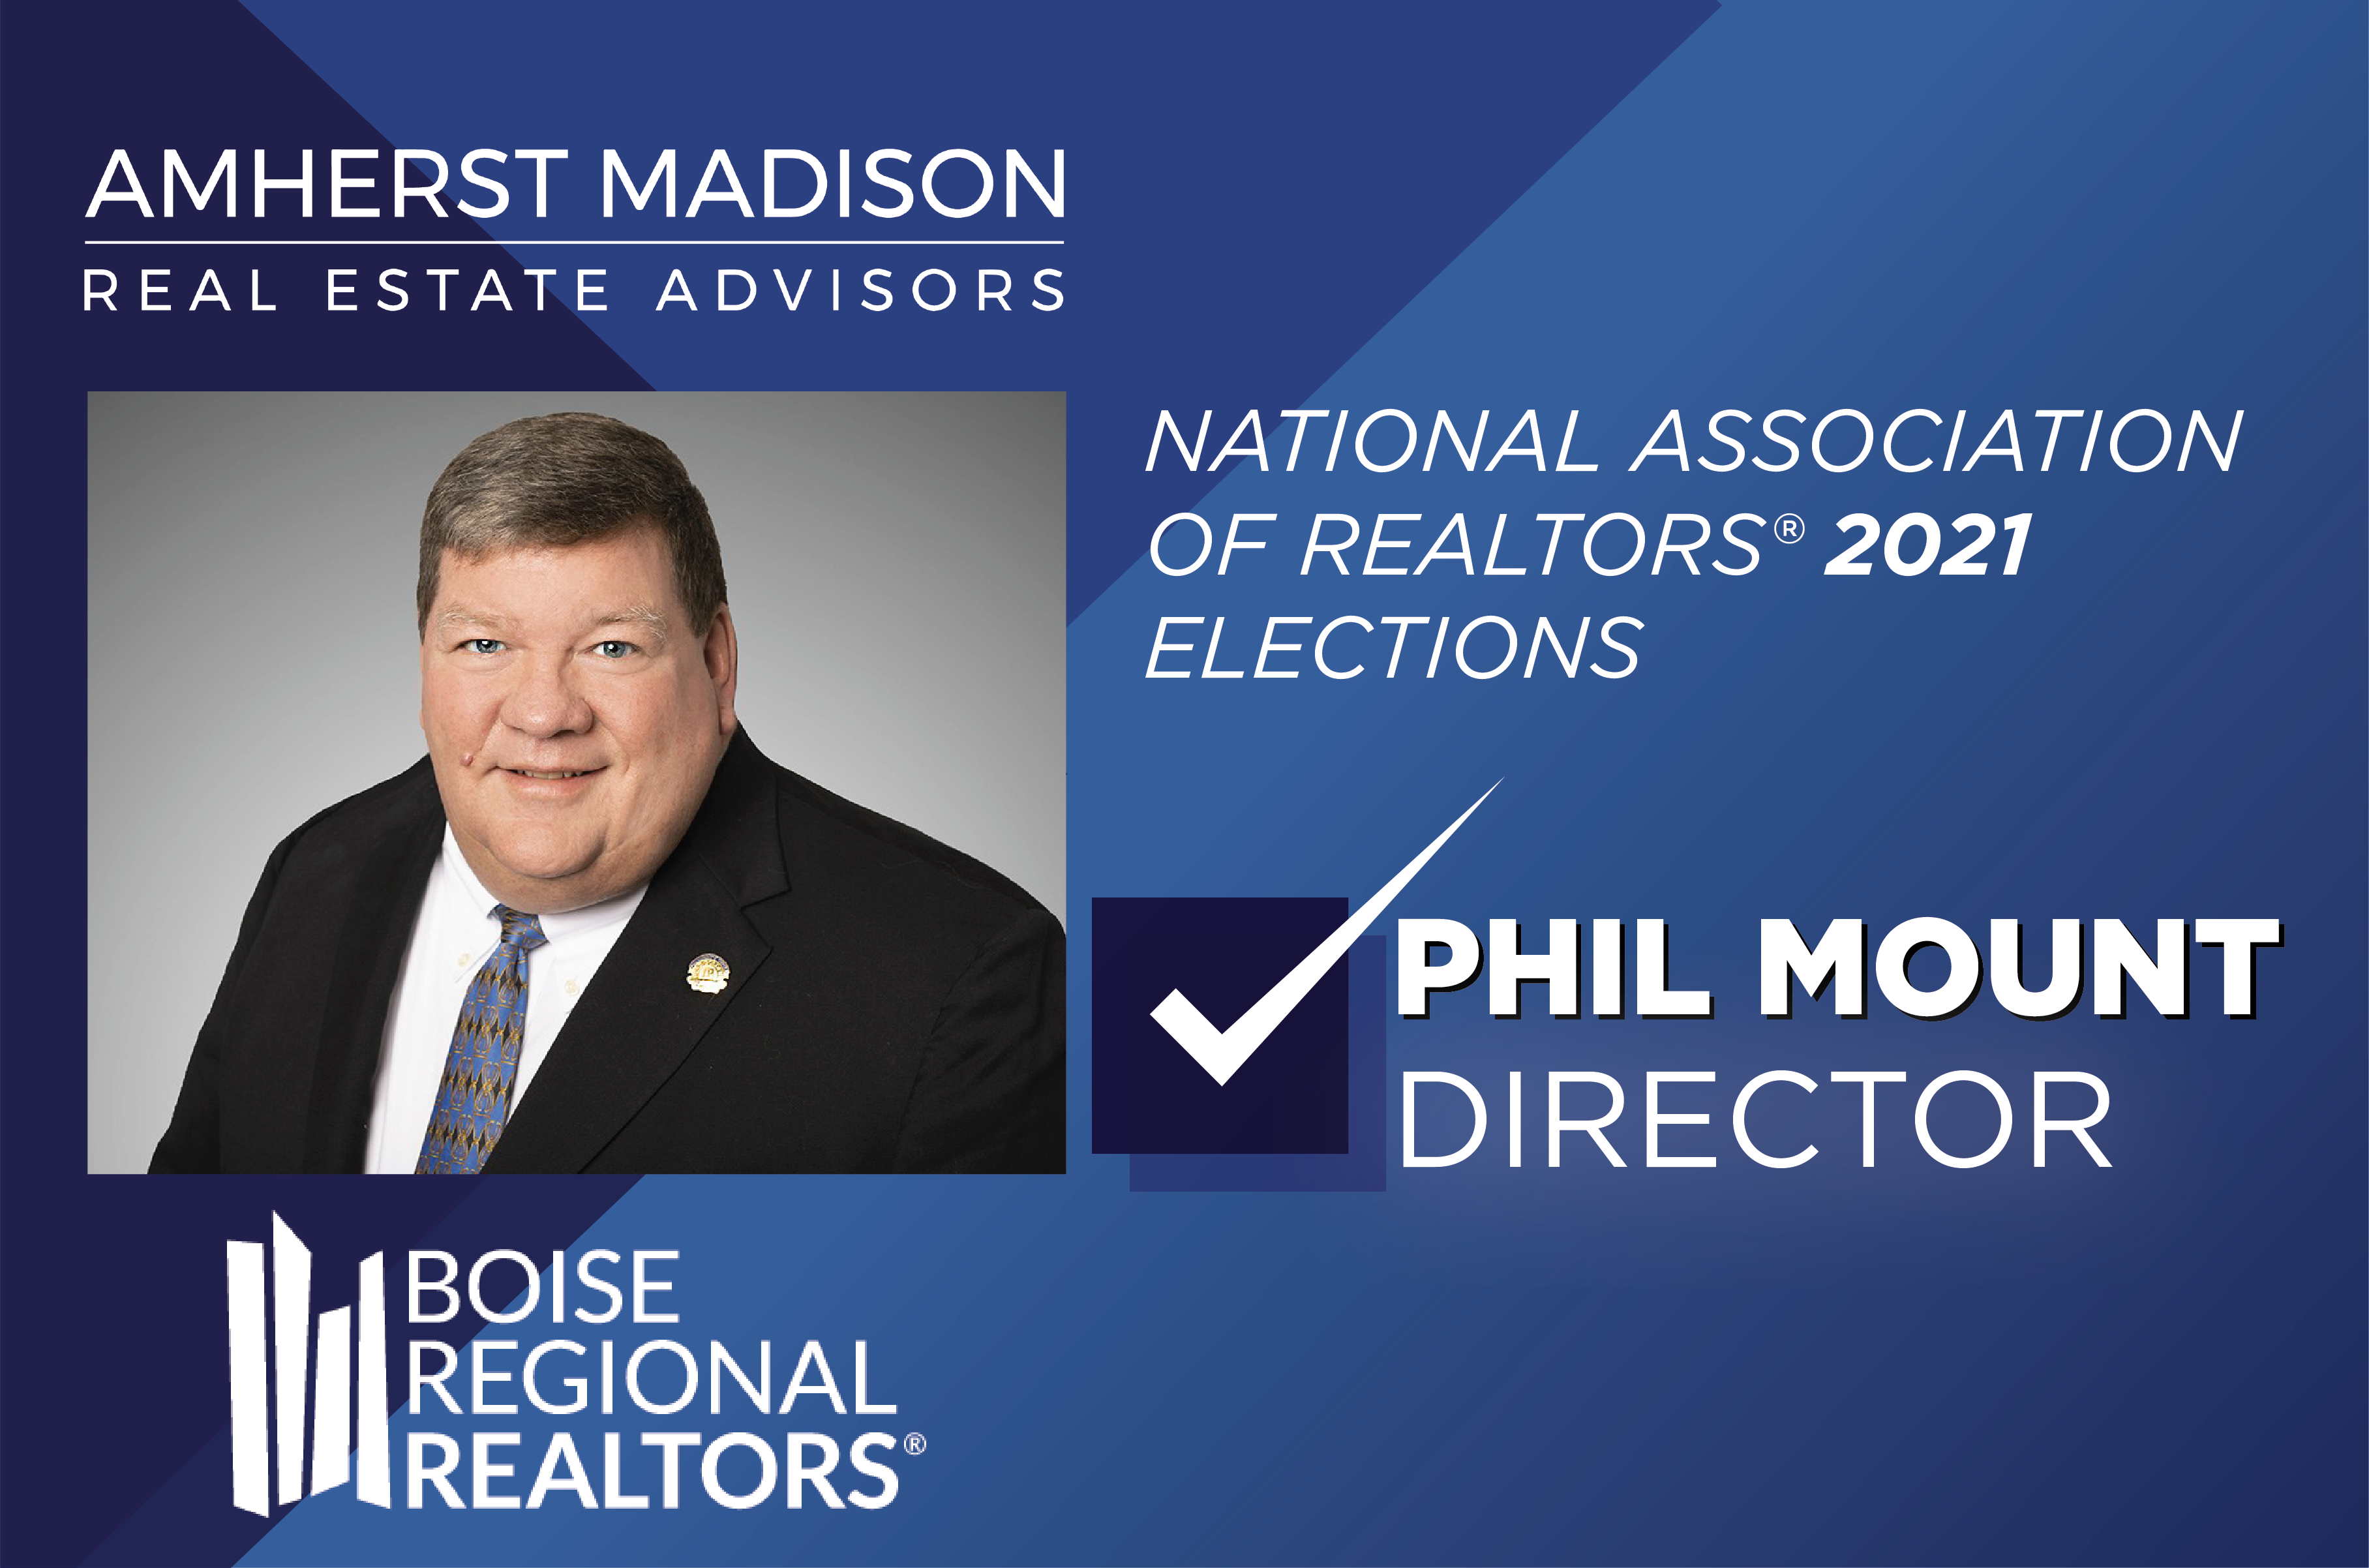 Regional Association of Realtors 2021 Elections | Phil Mount